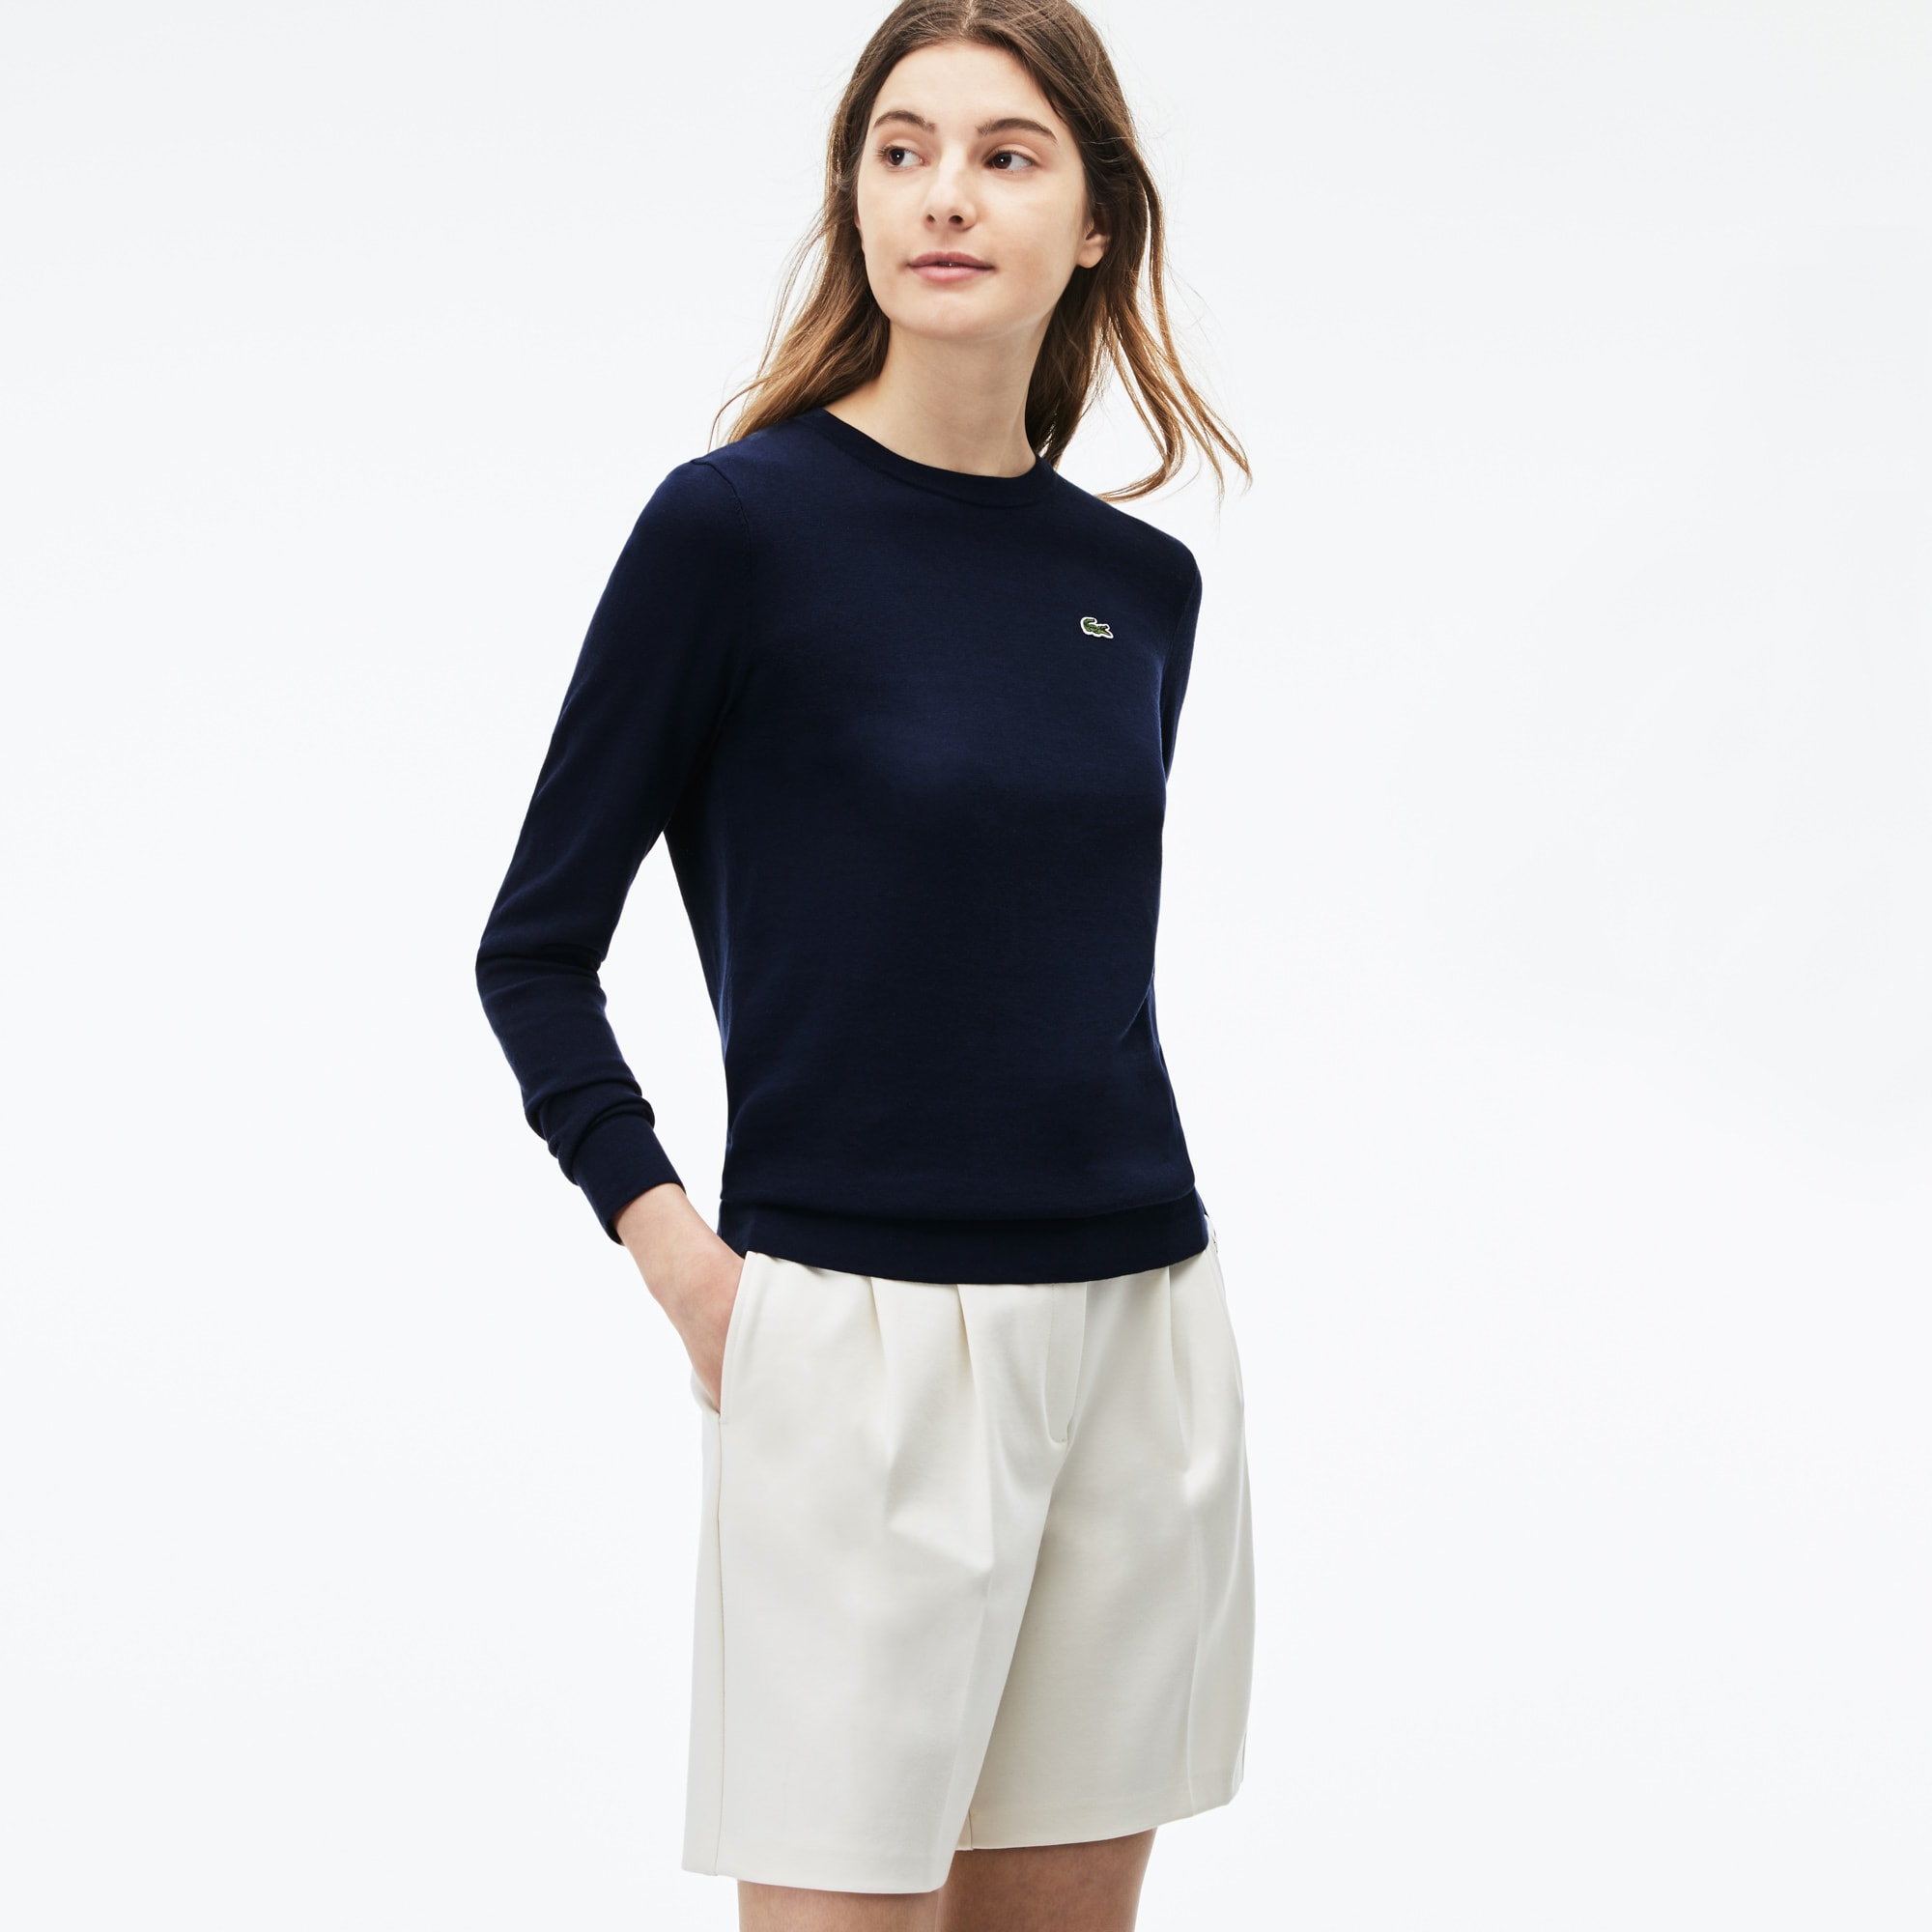 Women's High Neck Pinstriped Sweater